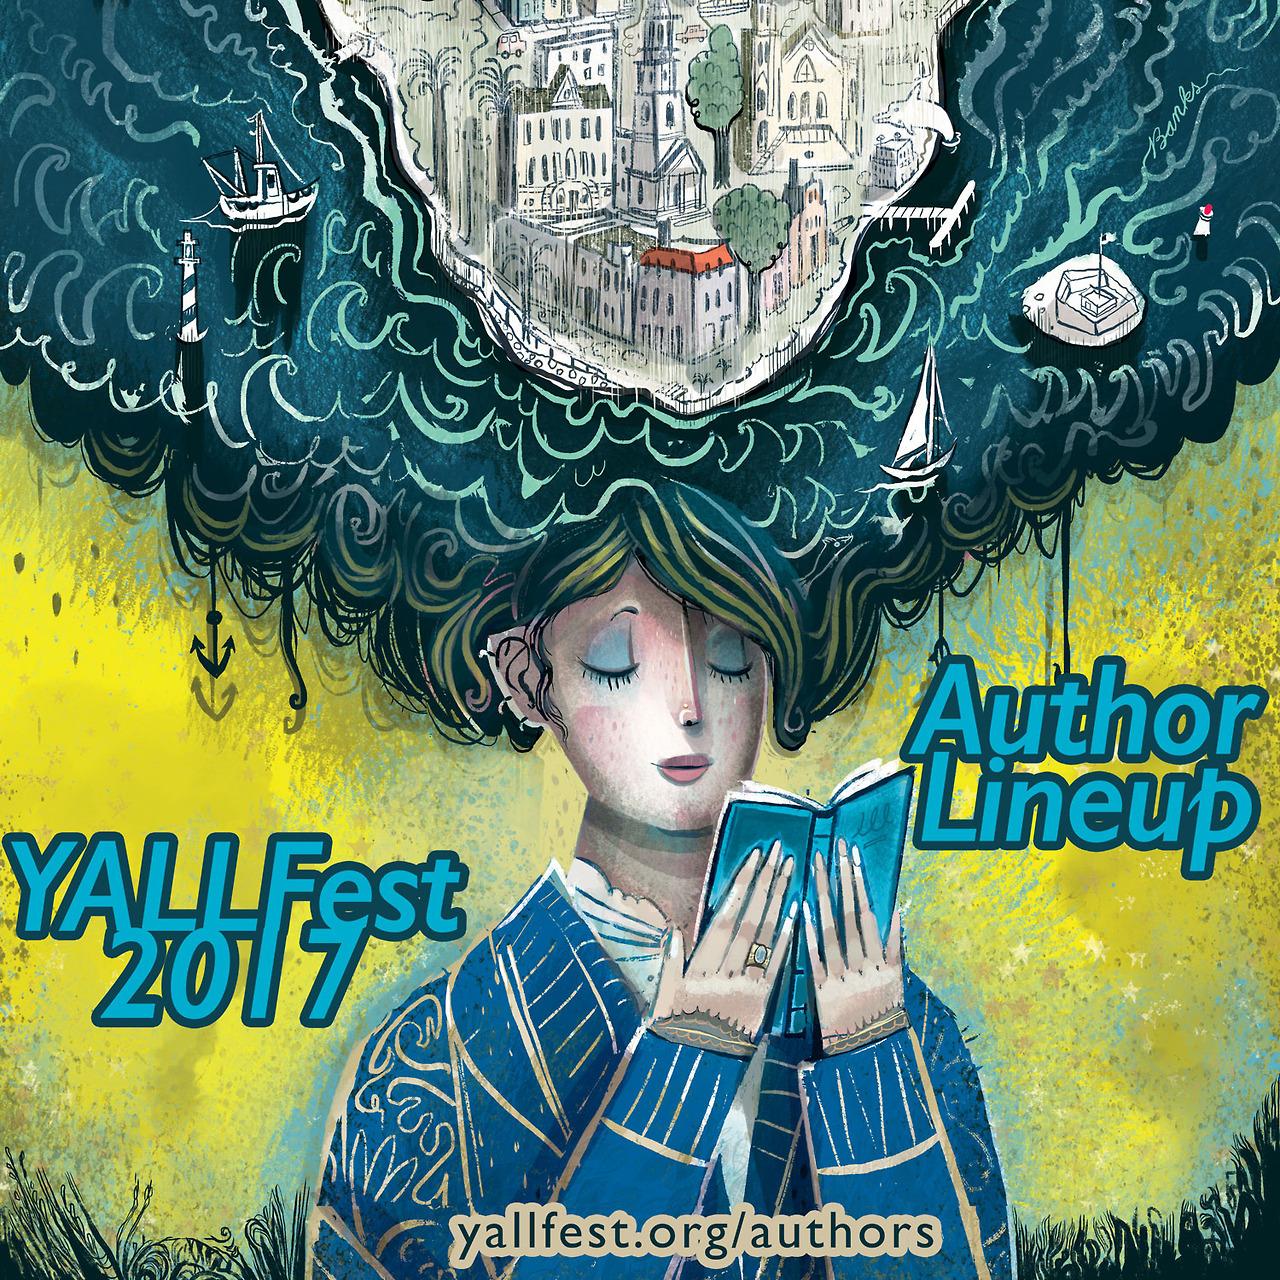 YALLFest 2017 author lineup announced